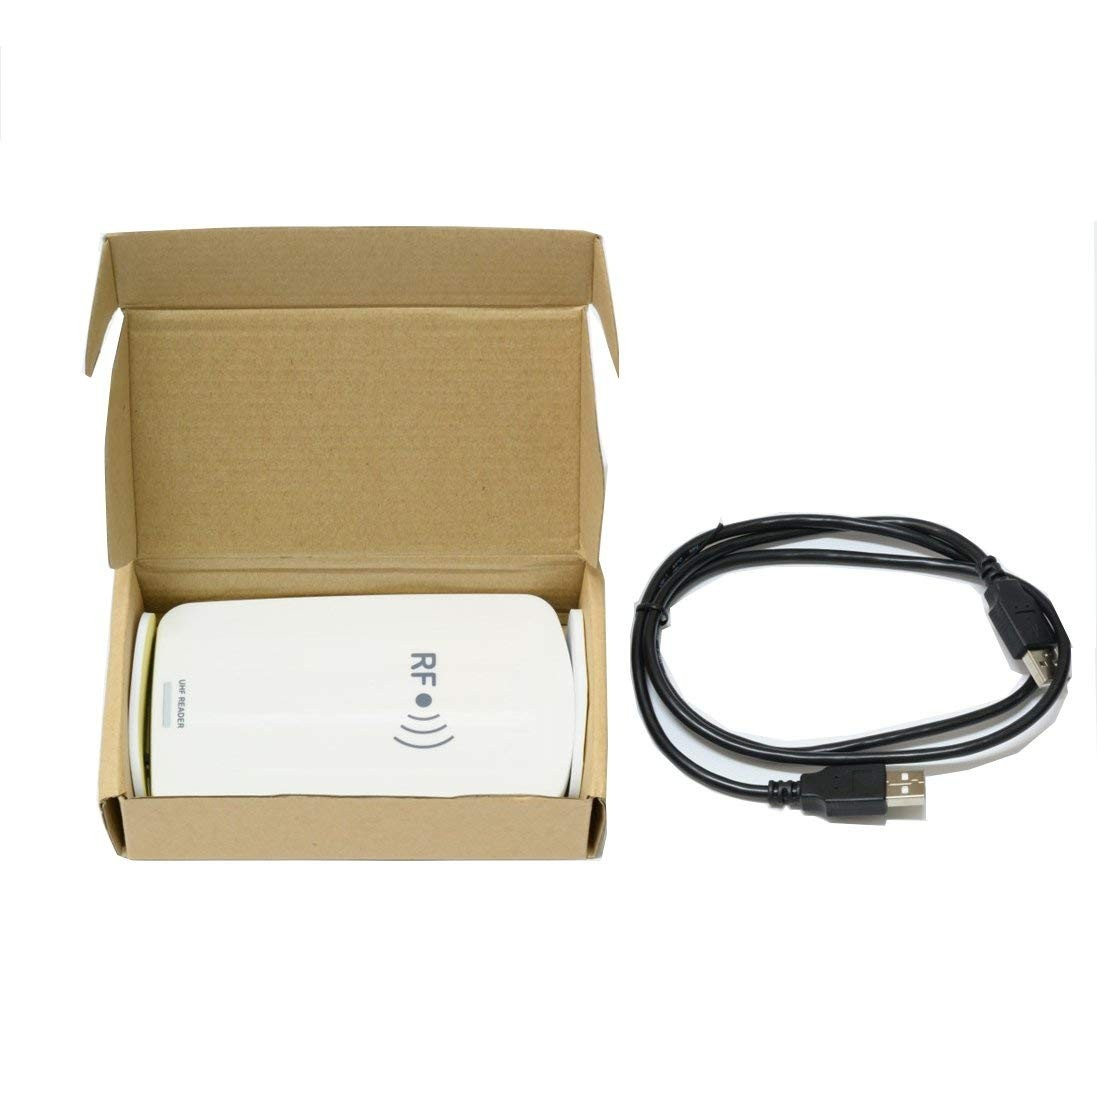 Yanzeo SR3308 860-960Mhz UHF RFID Reader Writer USB Desktop RFID Reader  with Keyboard Emulation Output Free SDK and UHF RFID TAG